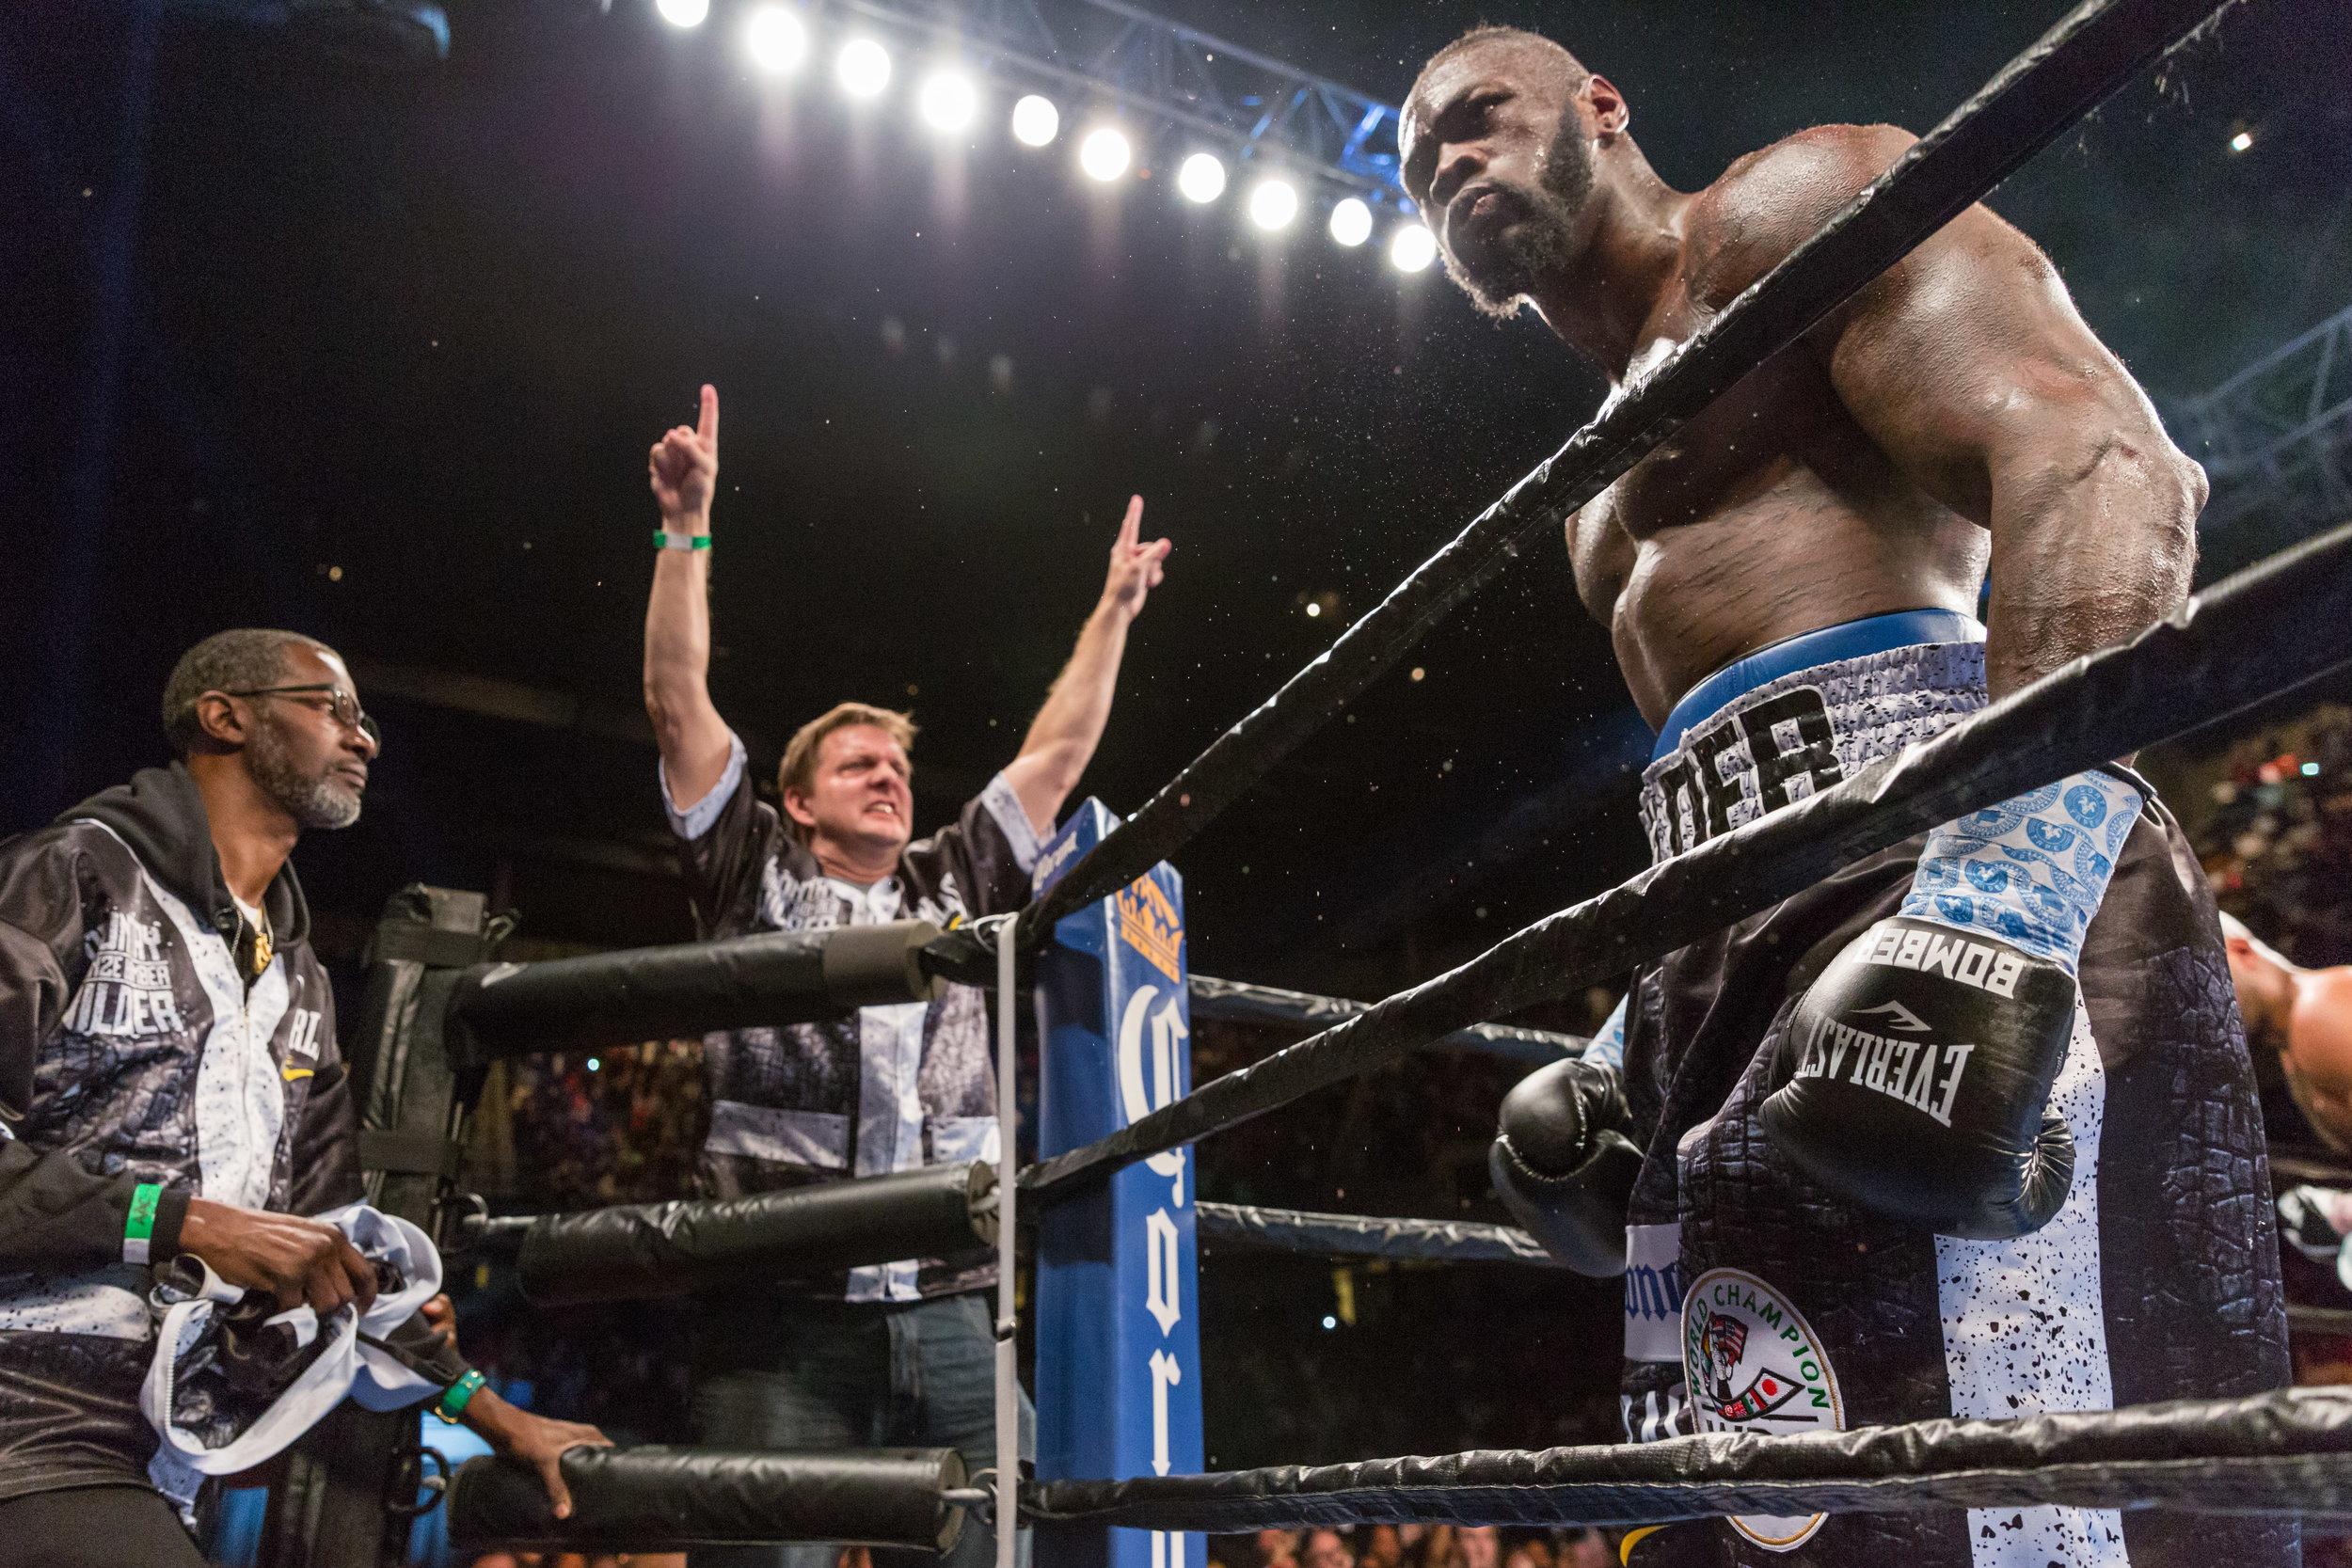 Deontay Wilder vs Gerald Washington - February 25_ 2017_02_25_2017_Fight_Ryan Hafey _ Premier Boxing Champions16.jpg